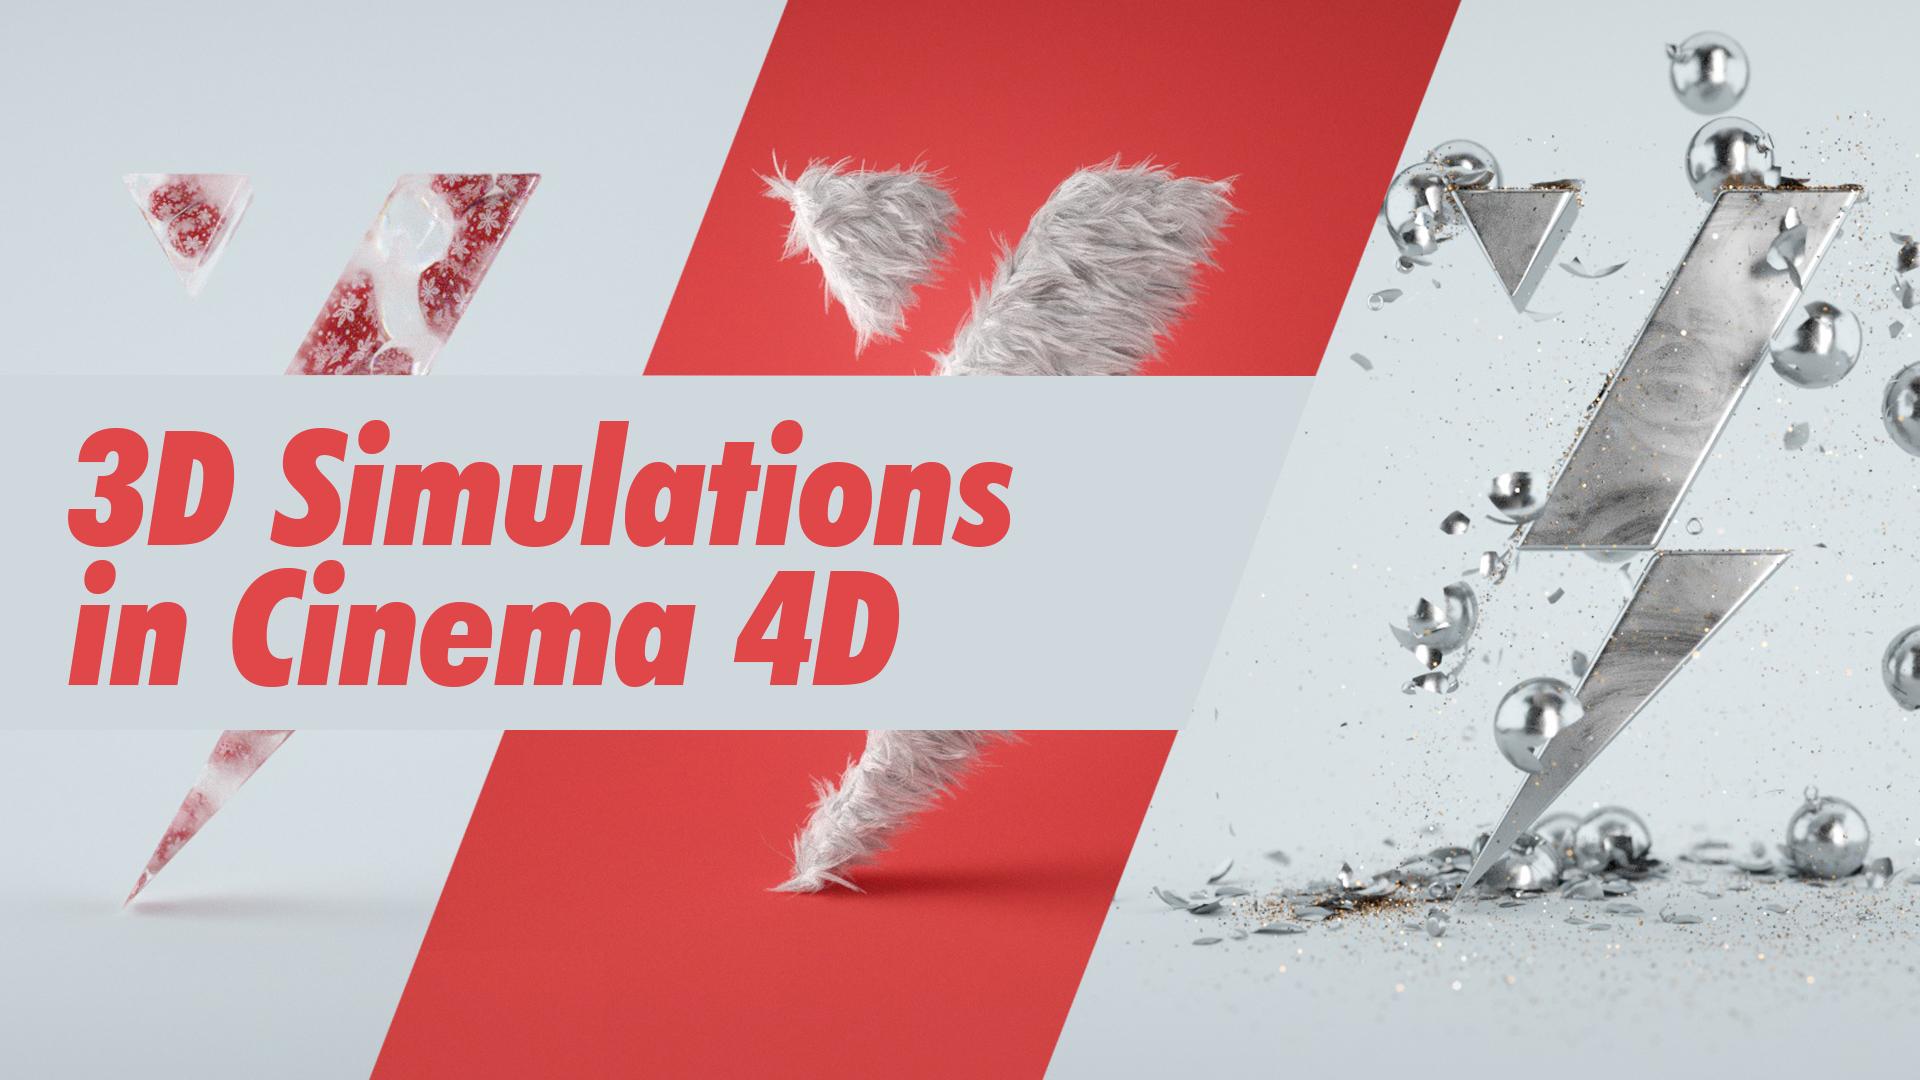 3D Simulations in Cinema 4D